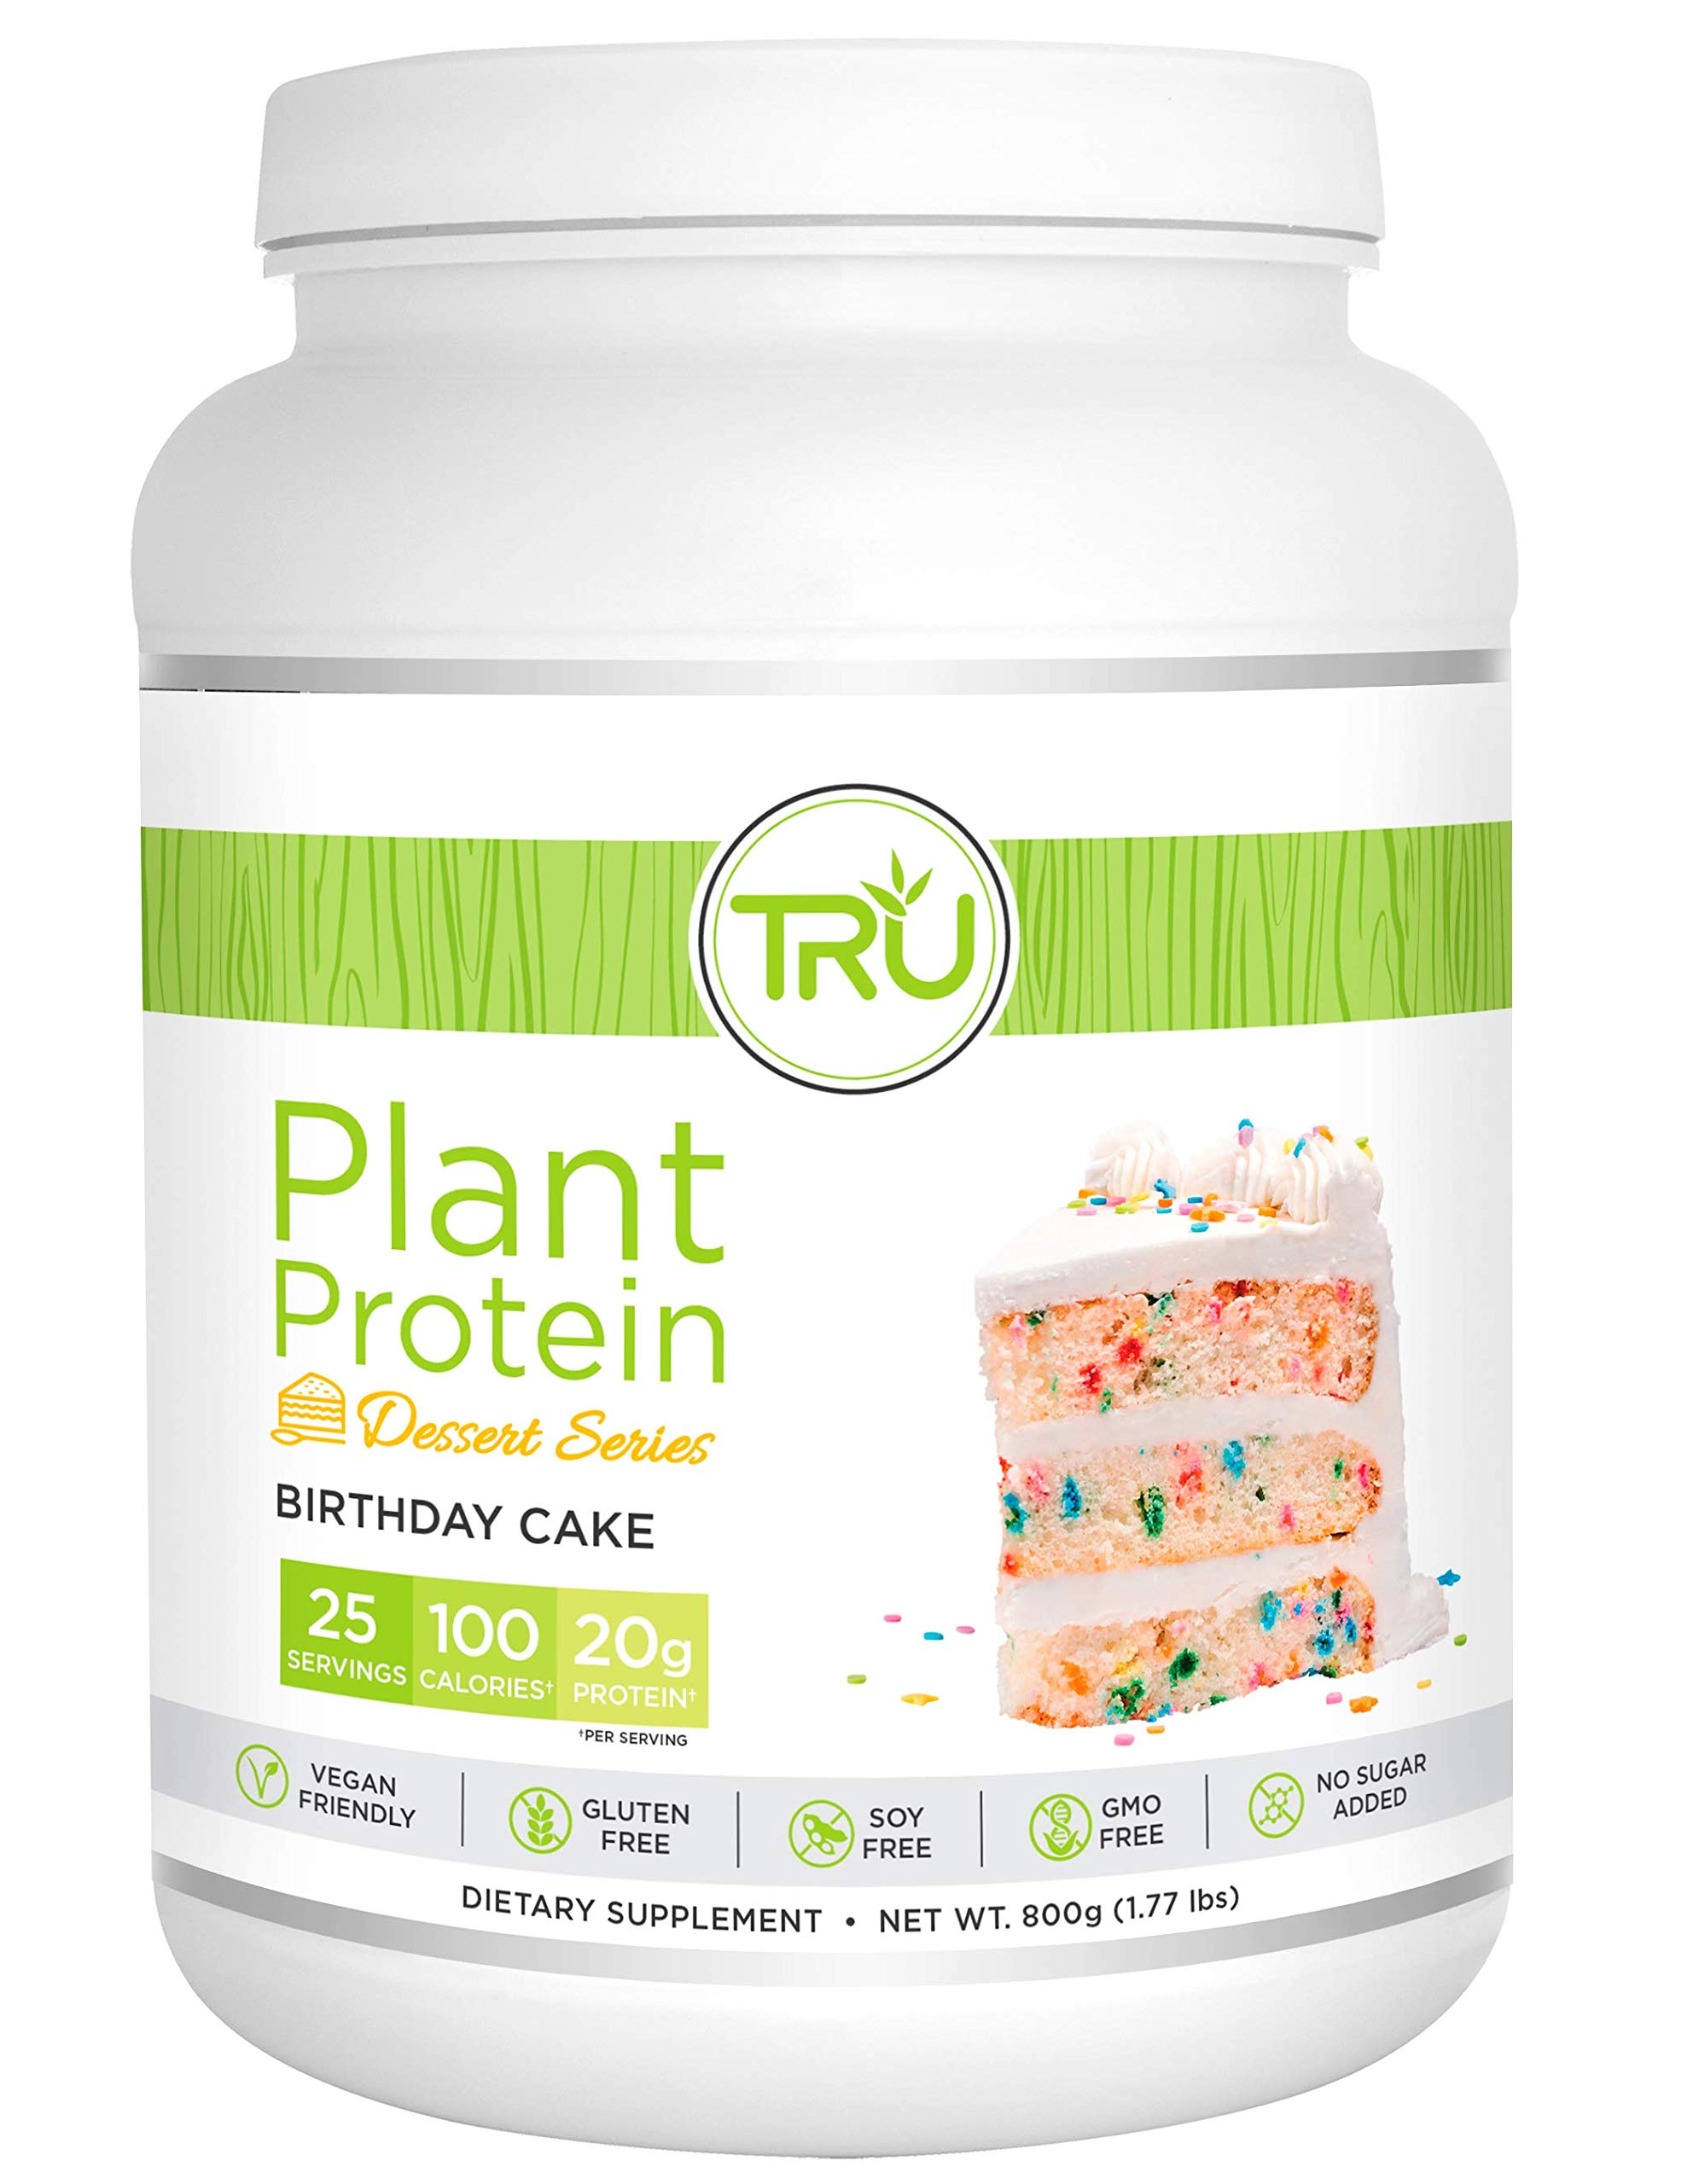 TRU Plant Based Protein Powder, Dessert Series, Vegan Friendly, Gluten Free, No Dairy, No Soy,25 Servings, Birthday Cake